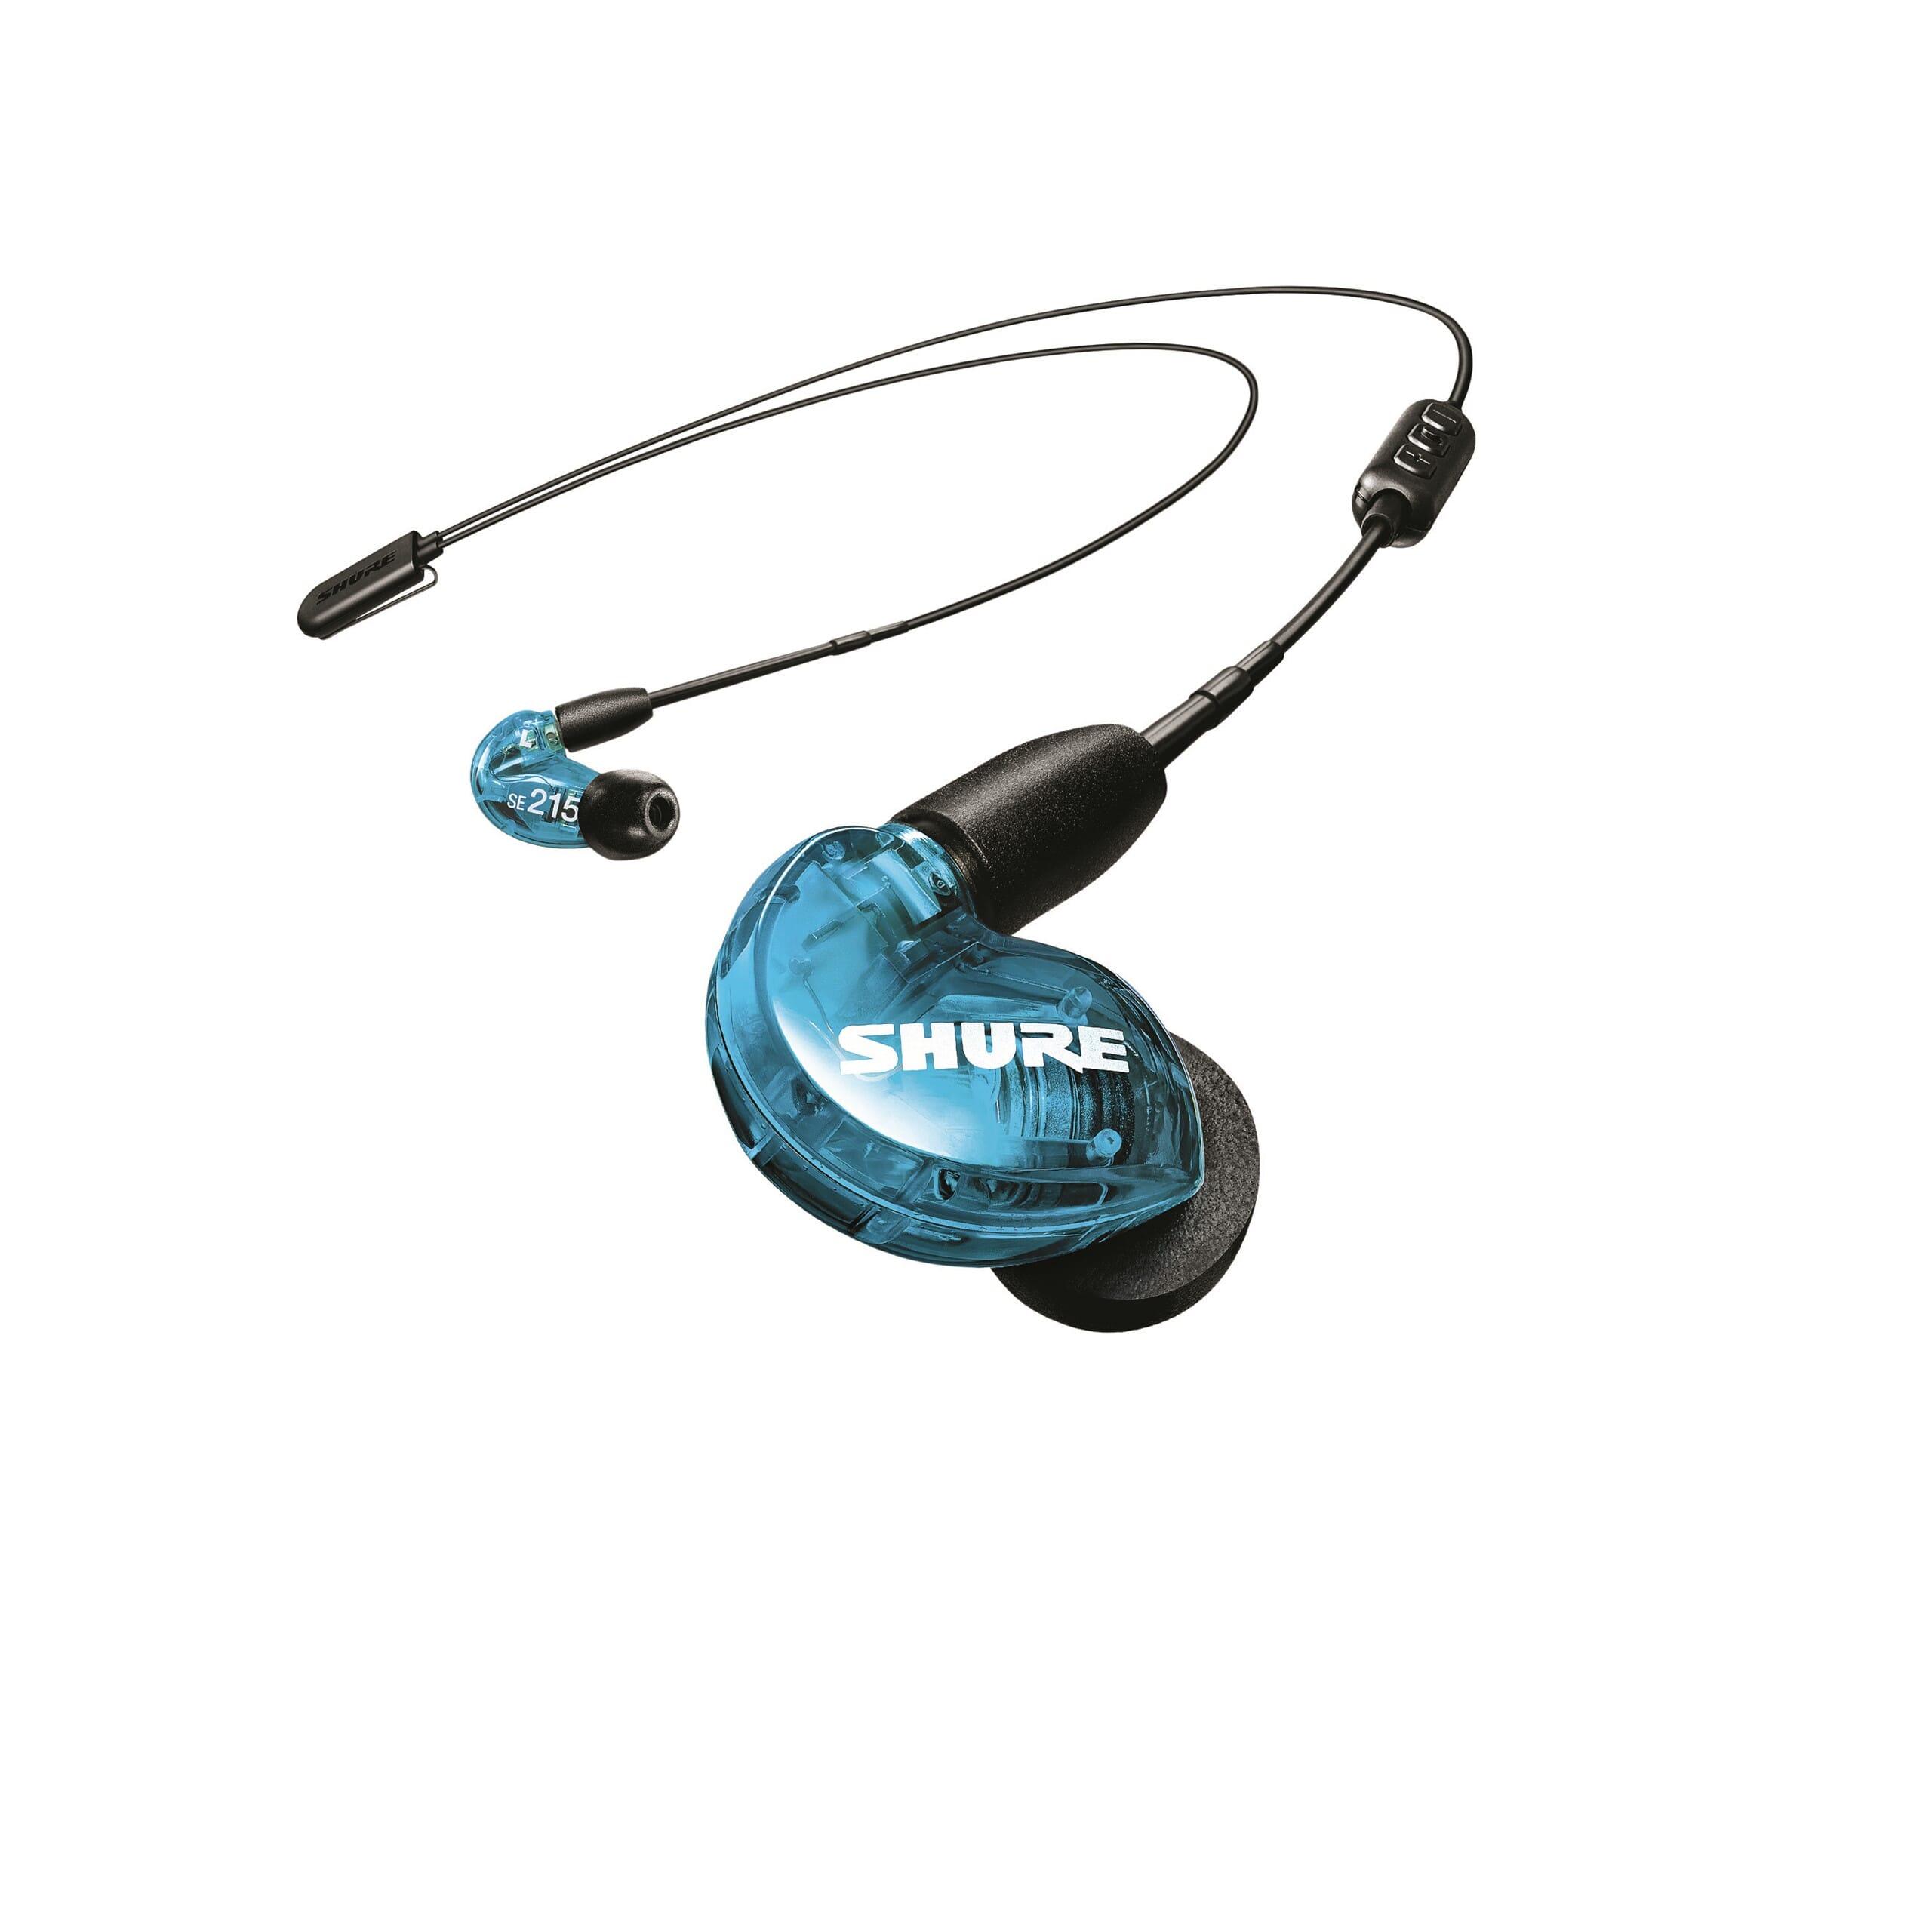 Shure SE 215 Wireless STEREOFIL AS